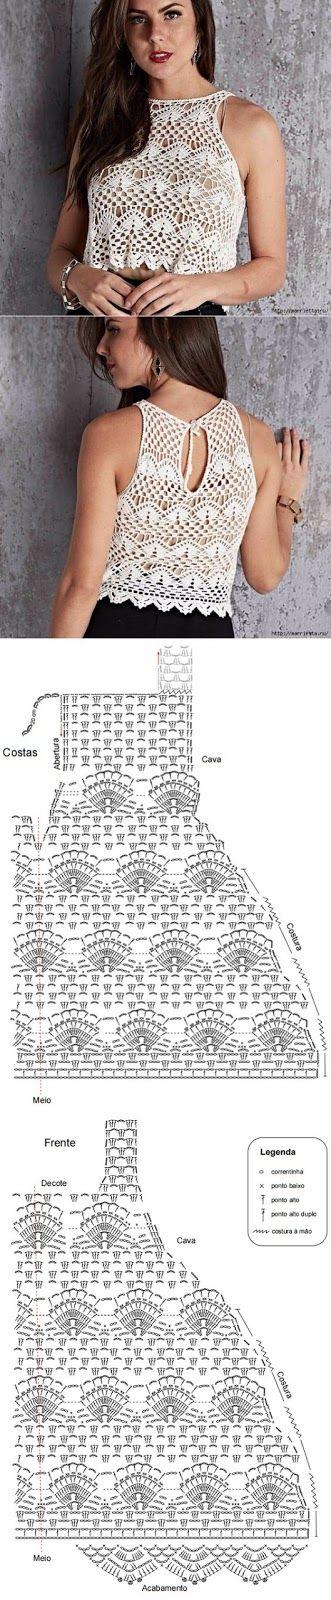 blusa crochet-tutorial-otakulandia.es